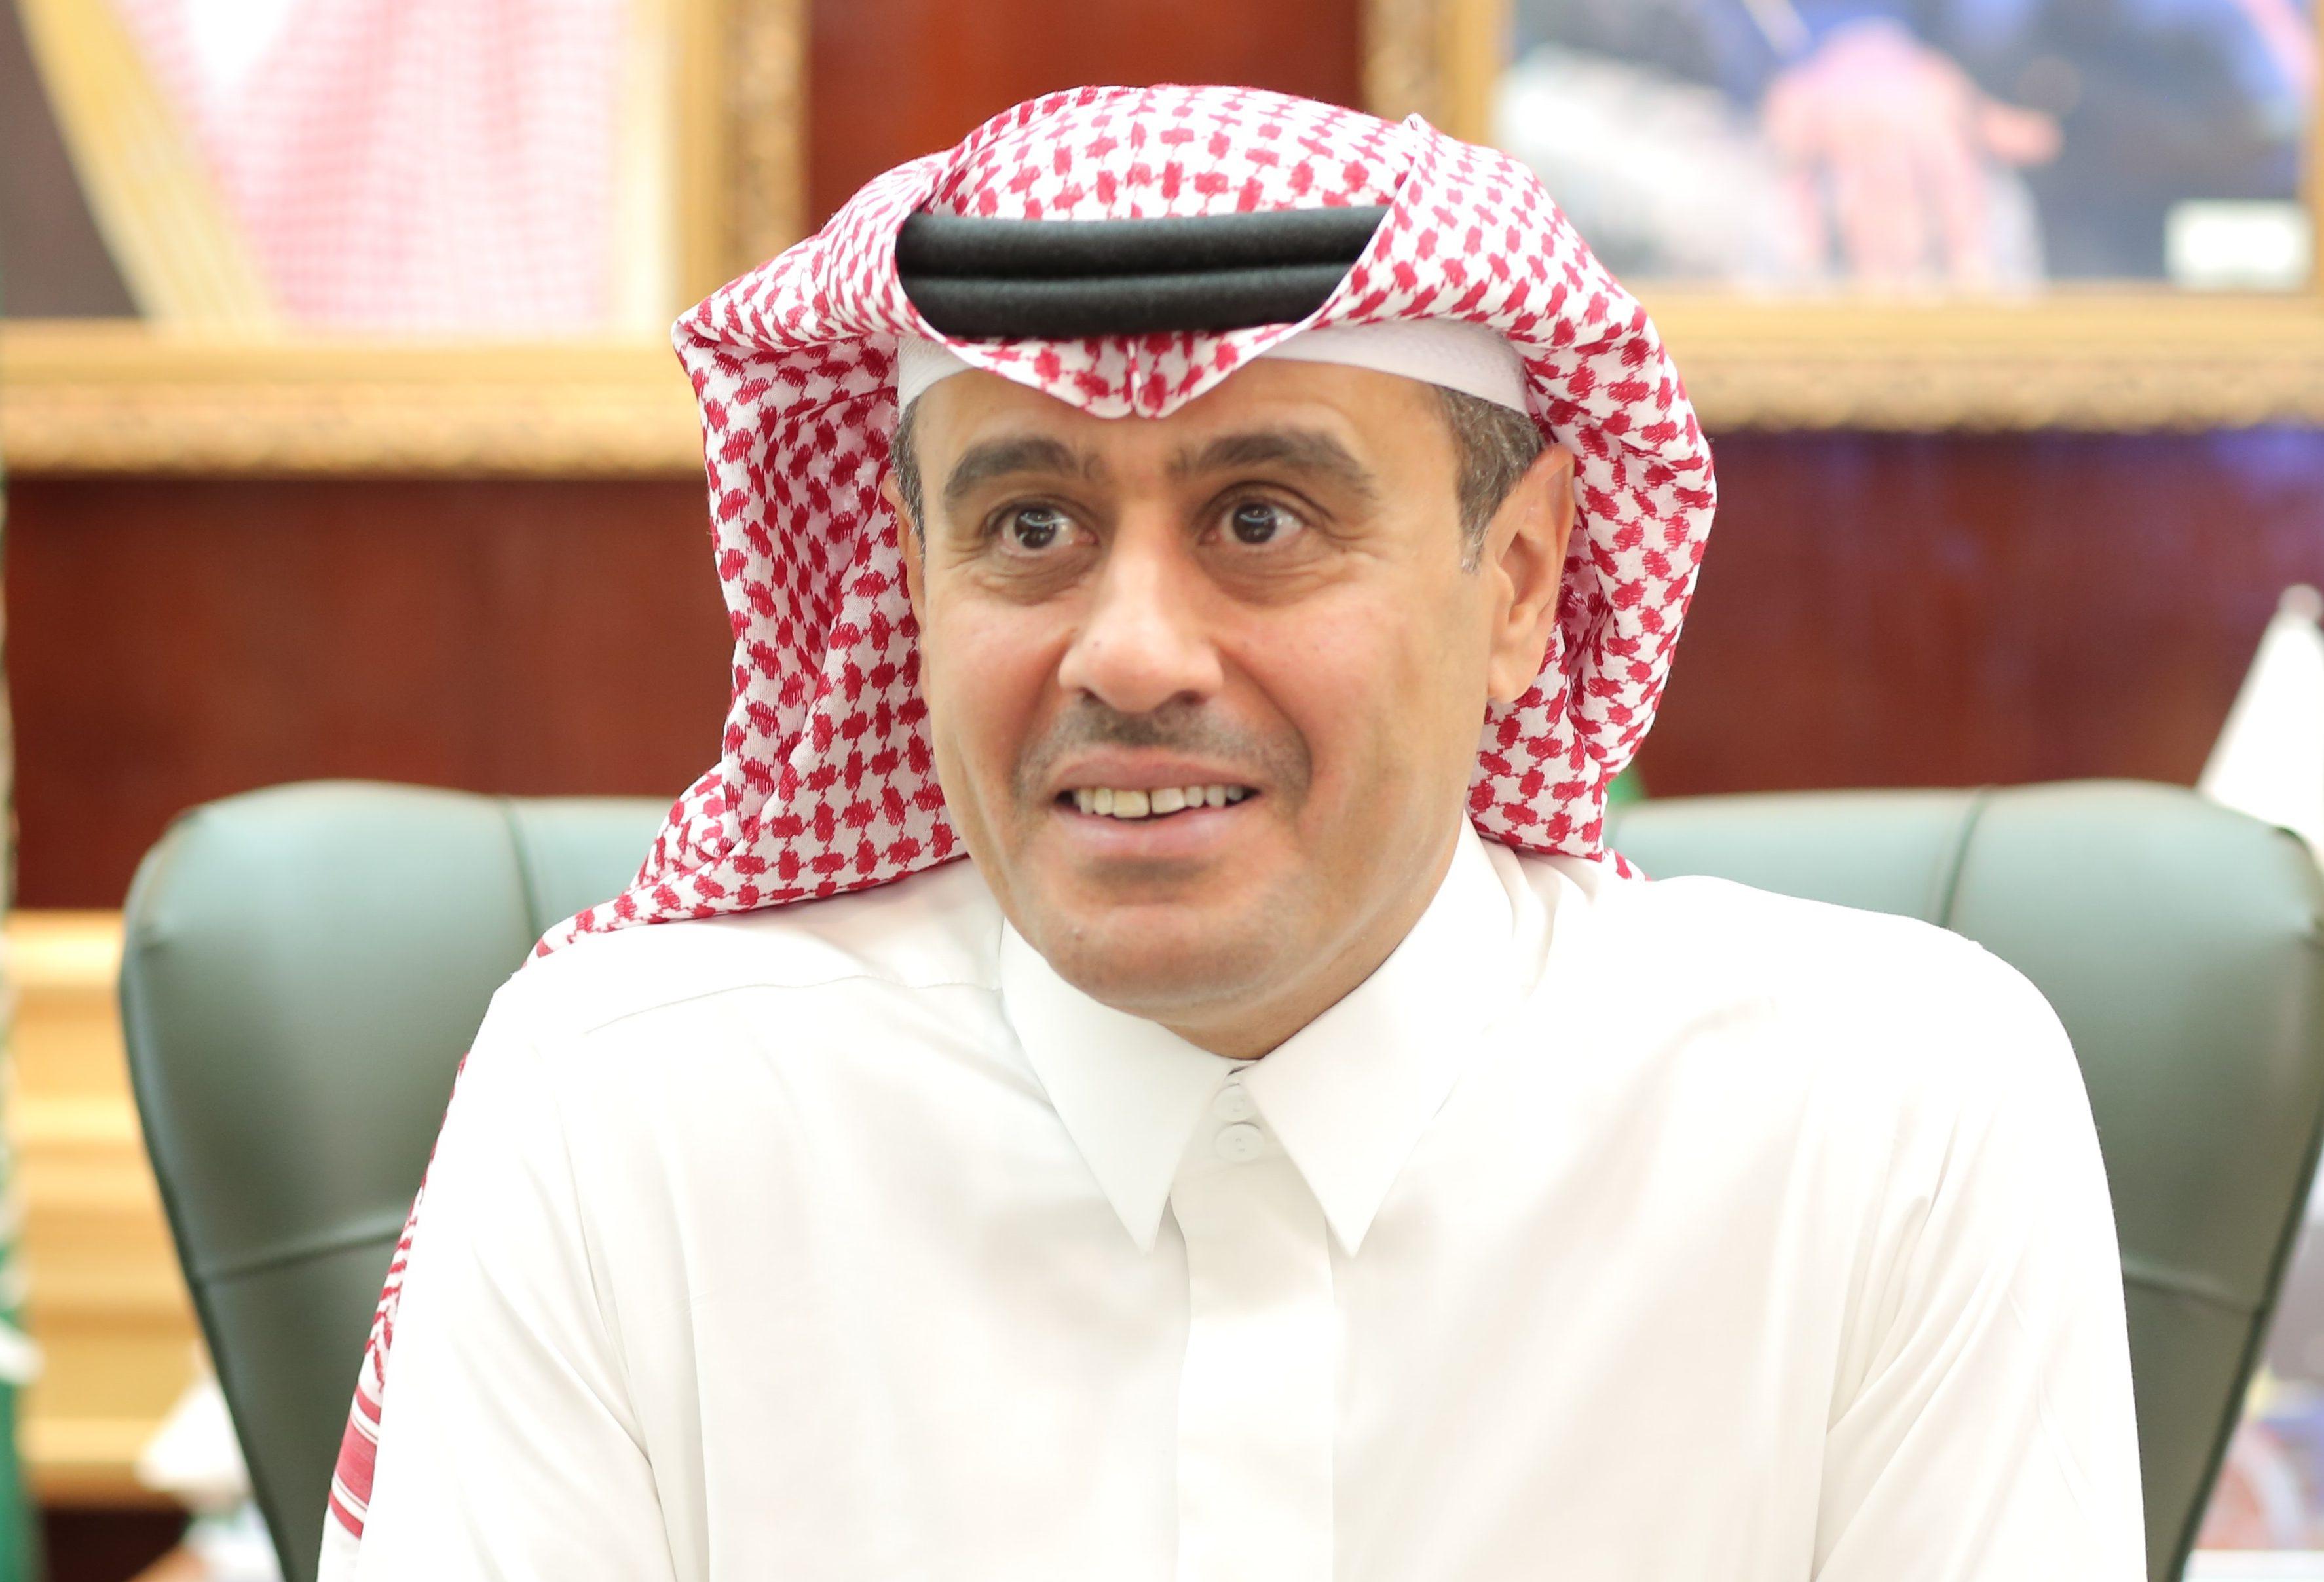 Saudi Arabia named official country partner for Gitex 2016